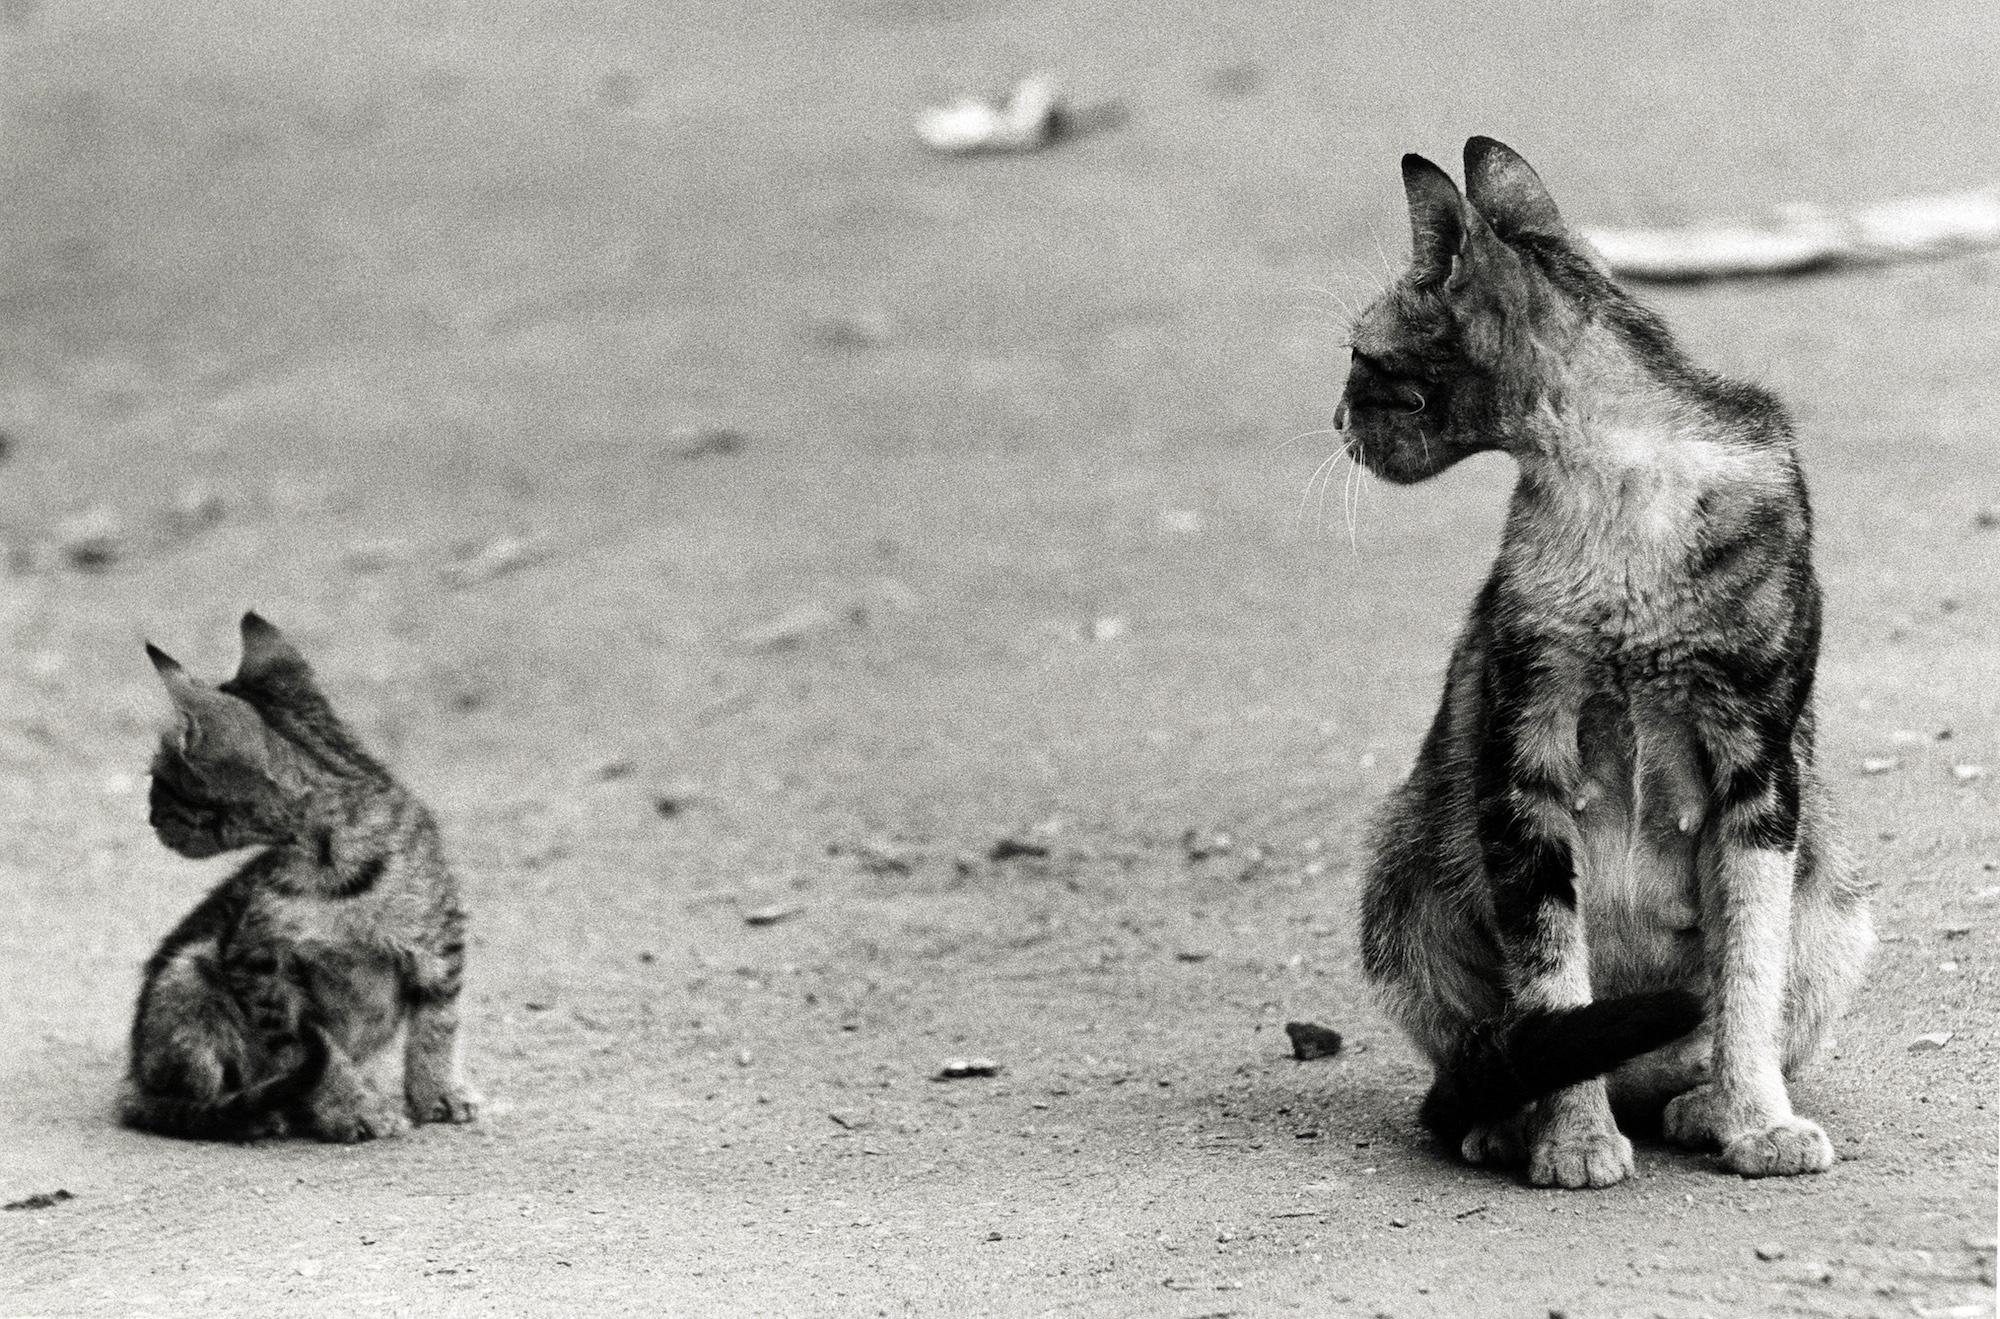 walter_rothwell_photography_cats-05.jpg